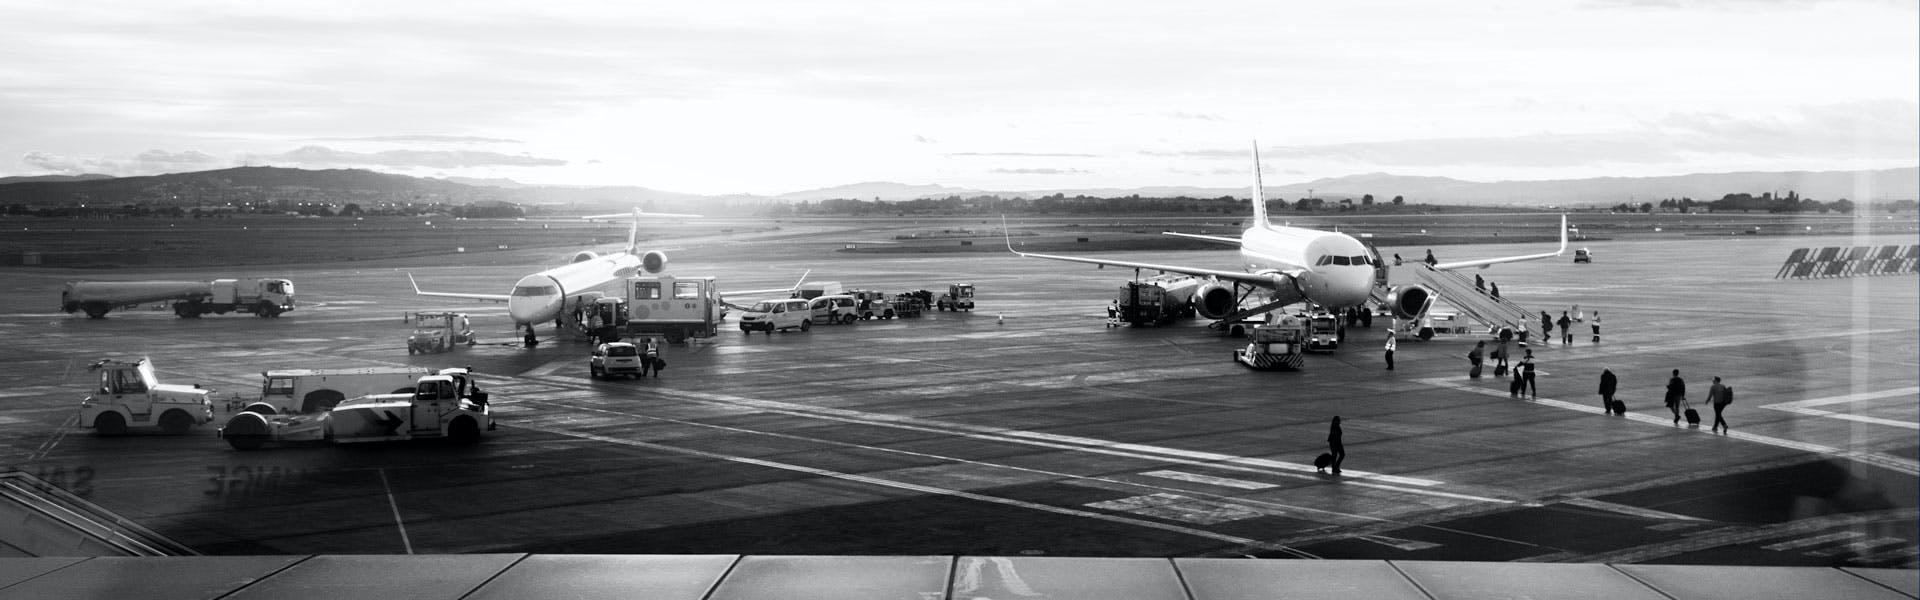 Passengers boarding a tour operator flight